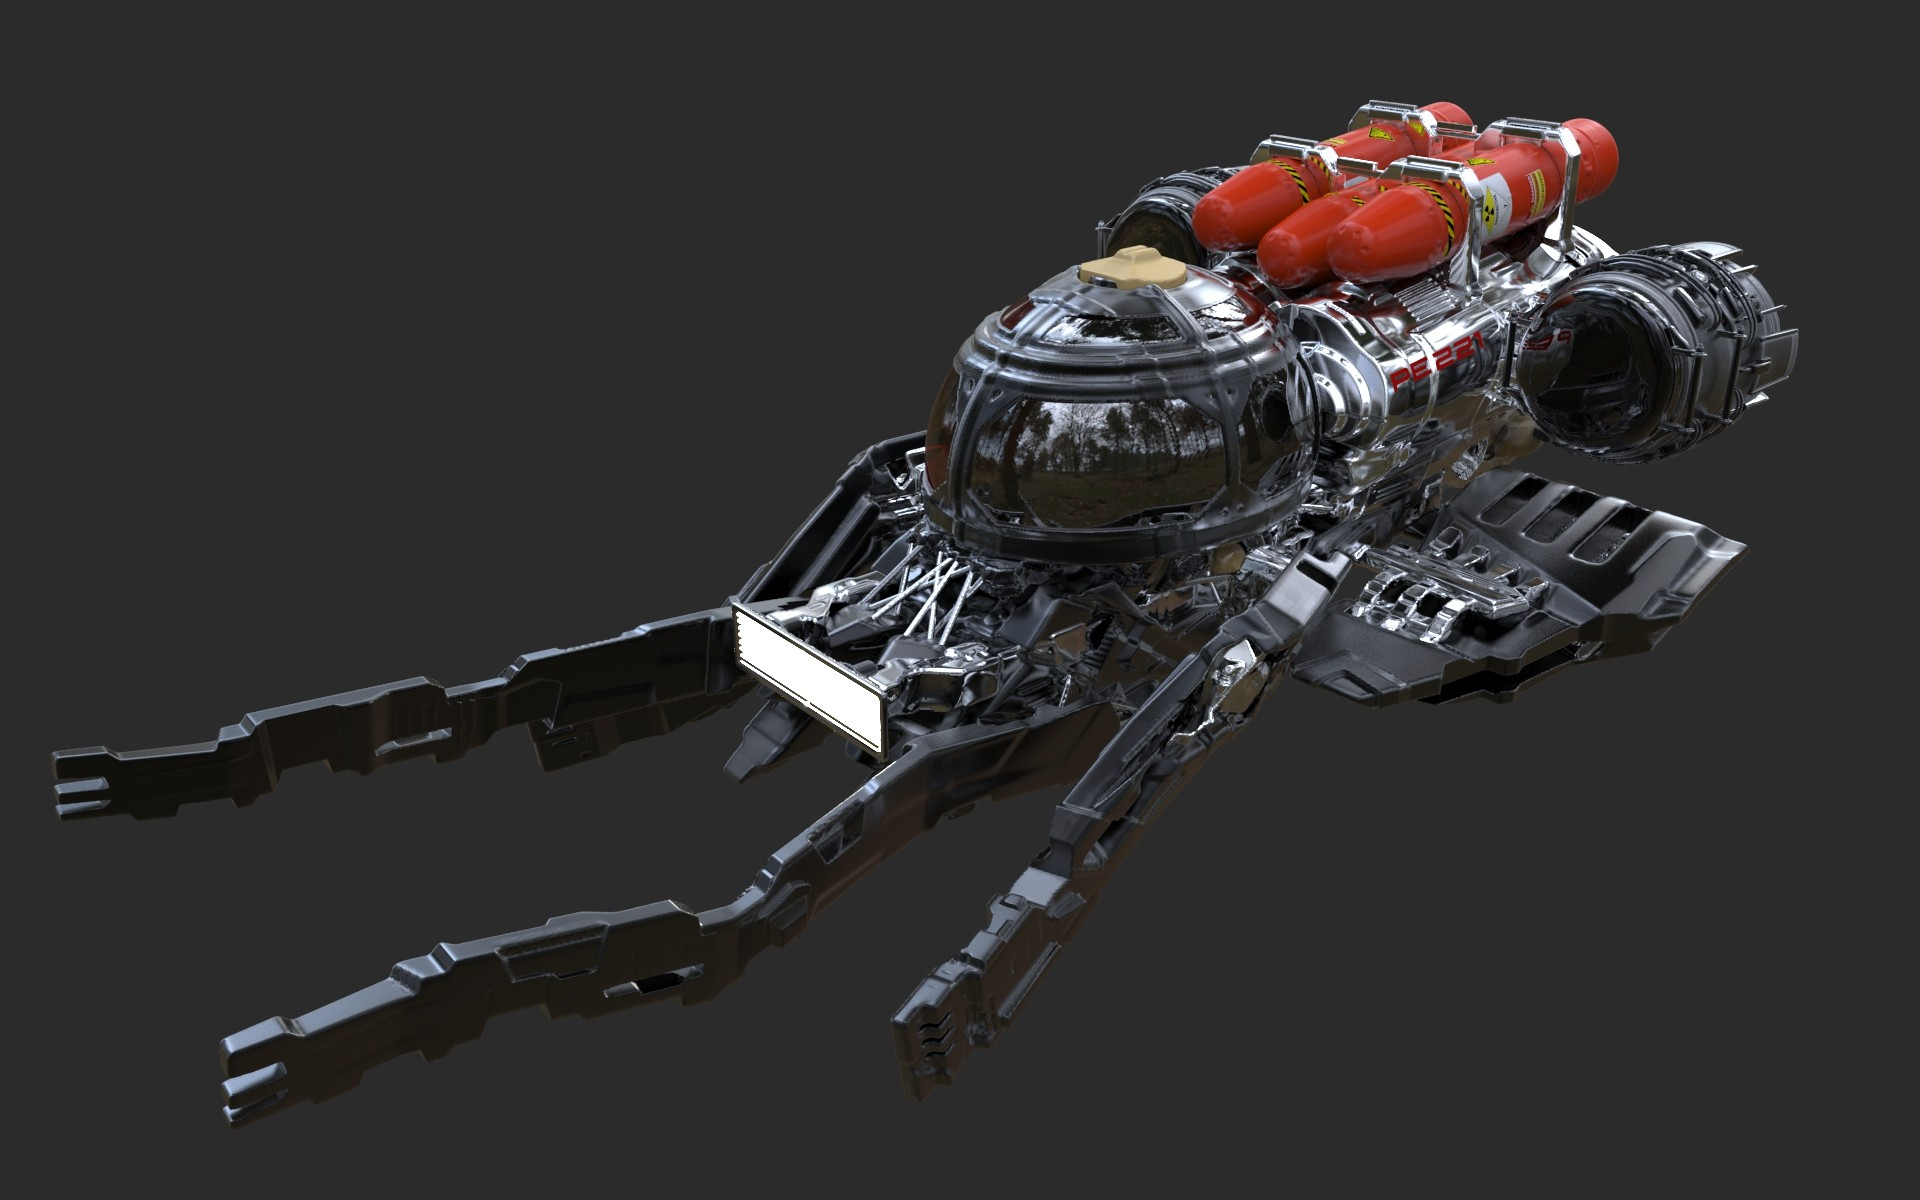 Sergio seabra shrimpfly spaceship2 47